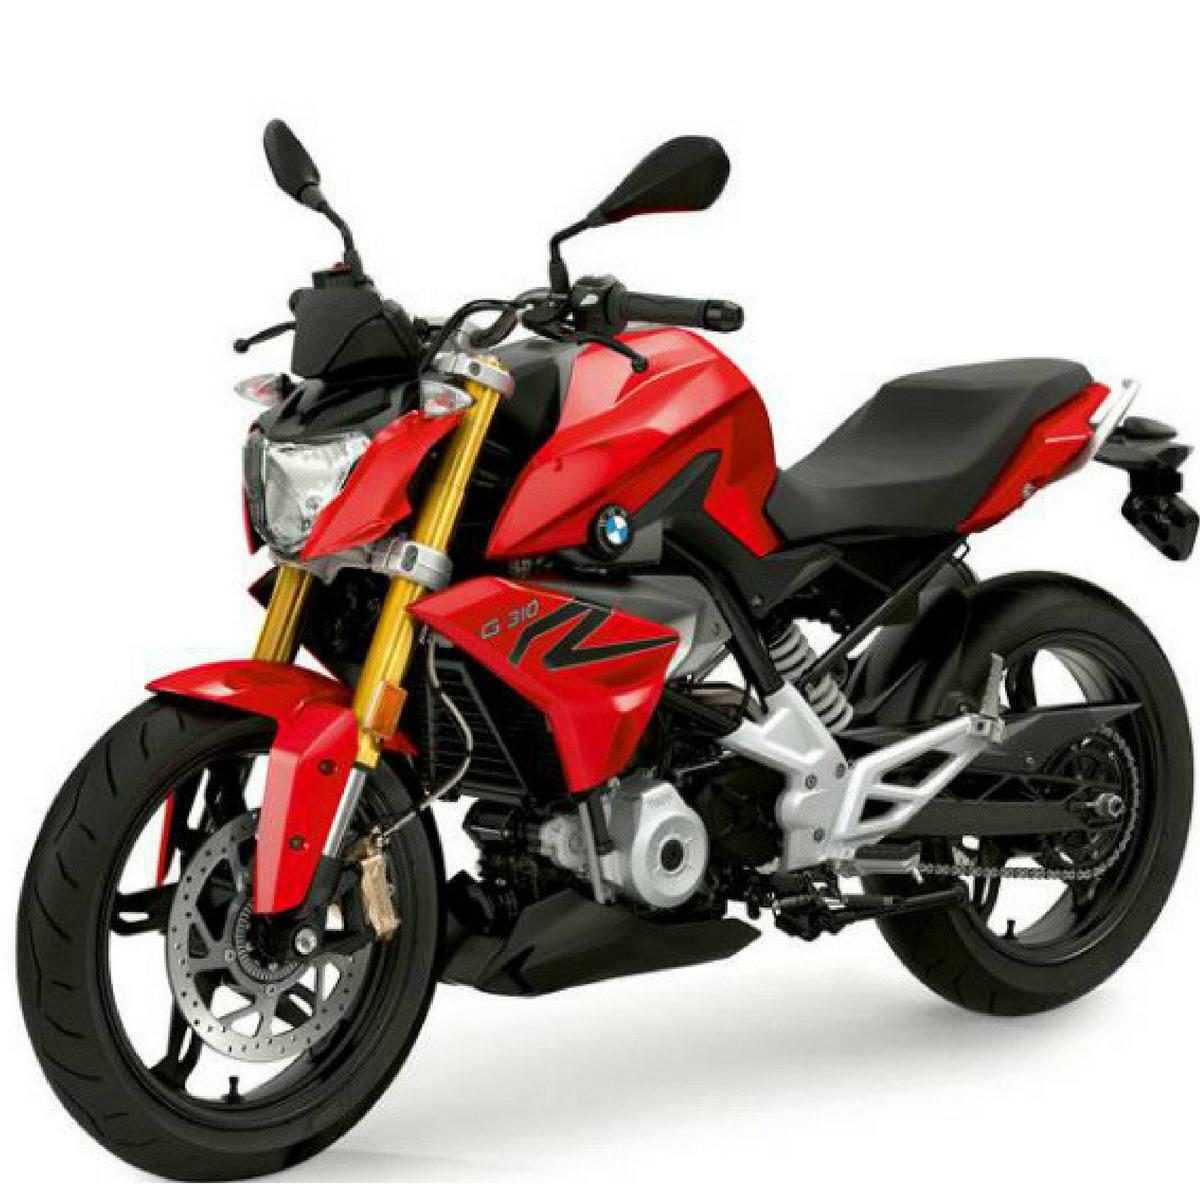 Bmwg310r New Color Bmw Bike Price Bmw Car Models Best